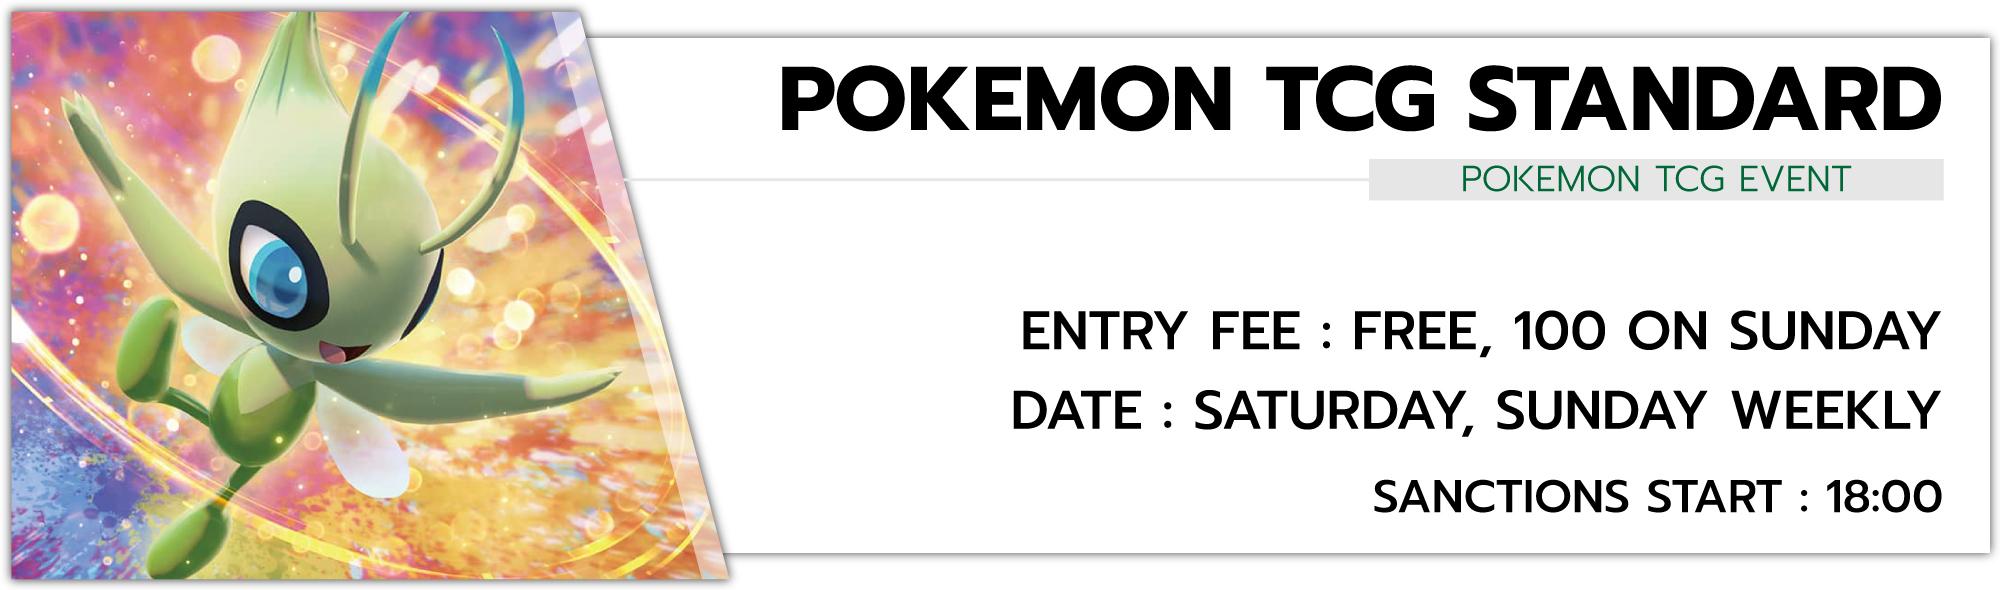 Pokemon TCG Standard Event